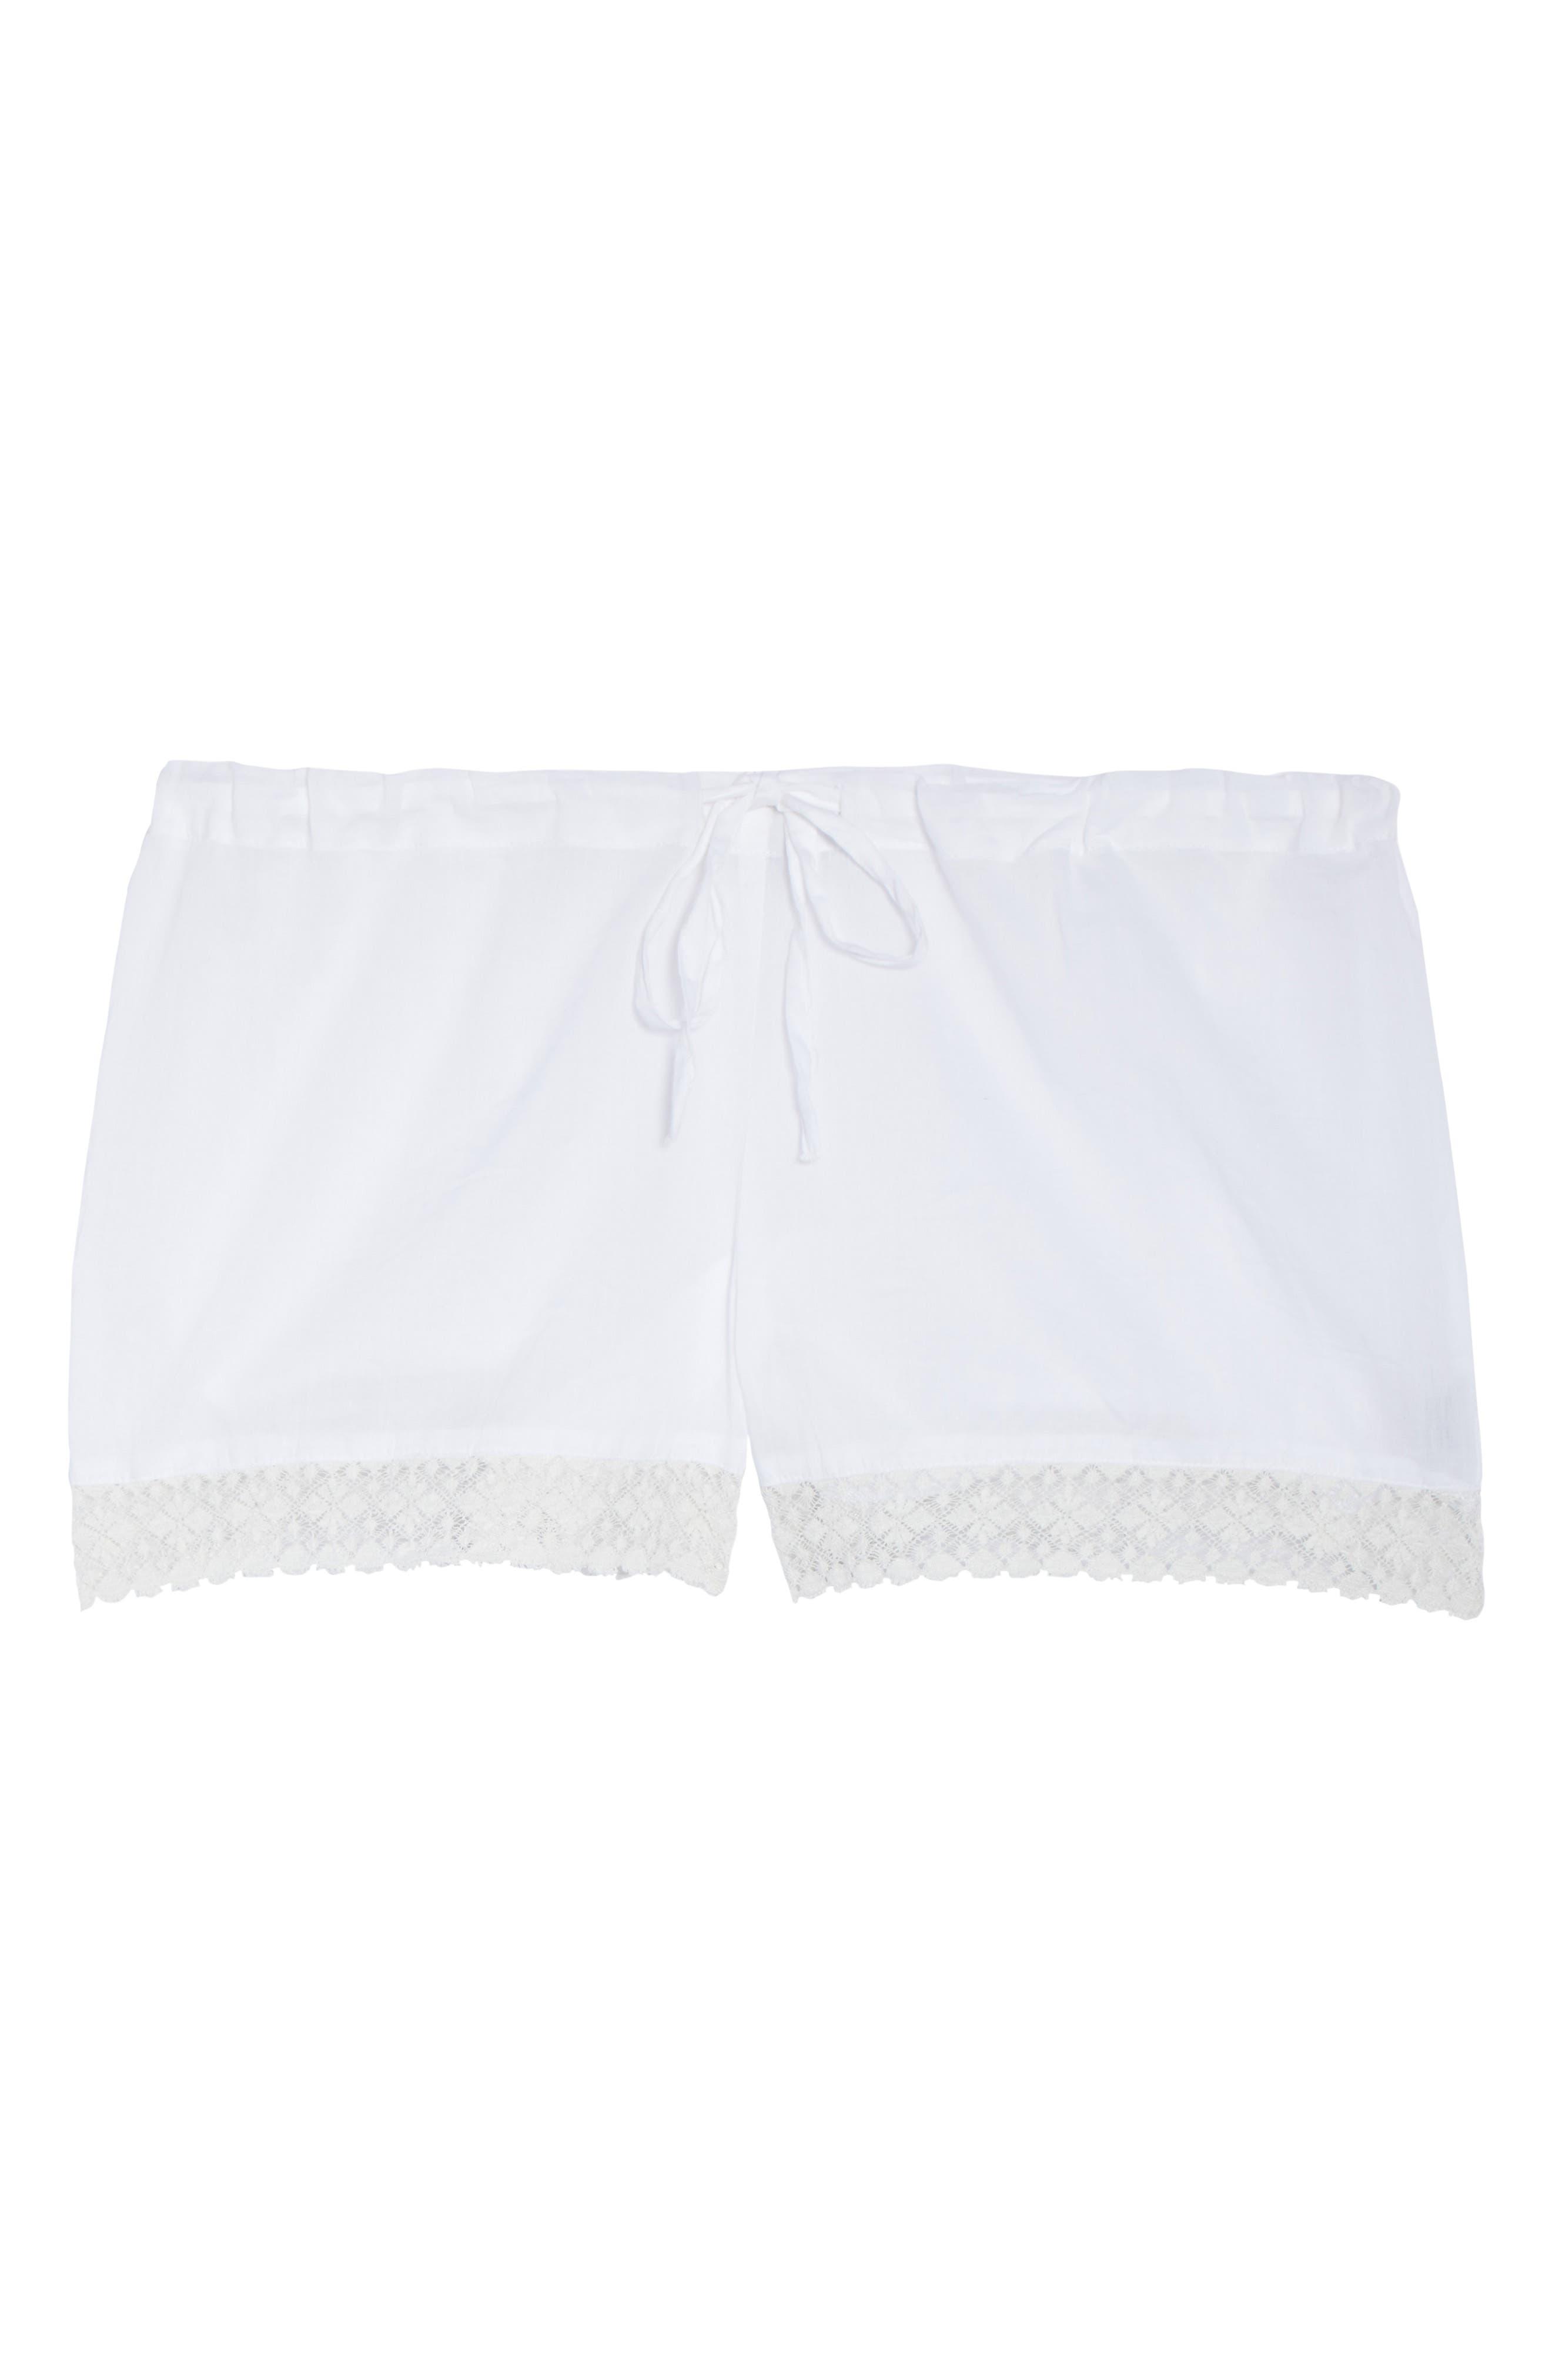 Lace Trim Sleep Shorts,                             Alternate thumbnail 4, color,                             White